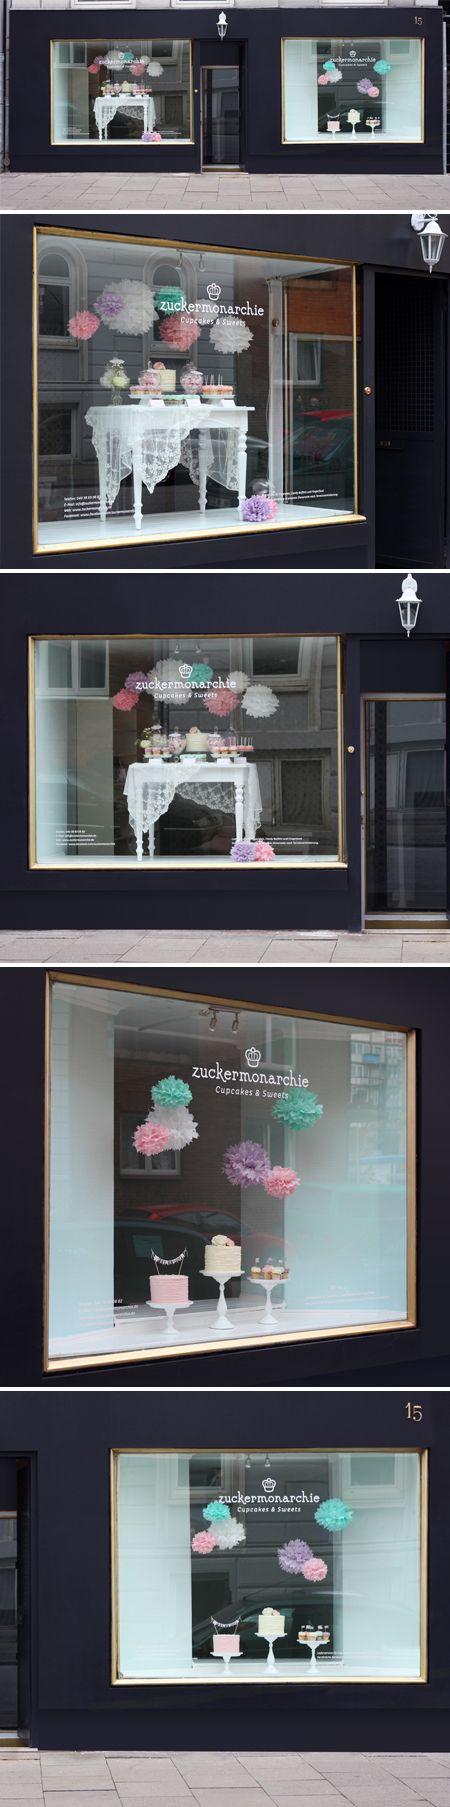 cute dessert table display in front window @Heather Brannan